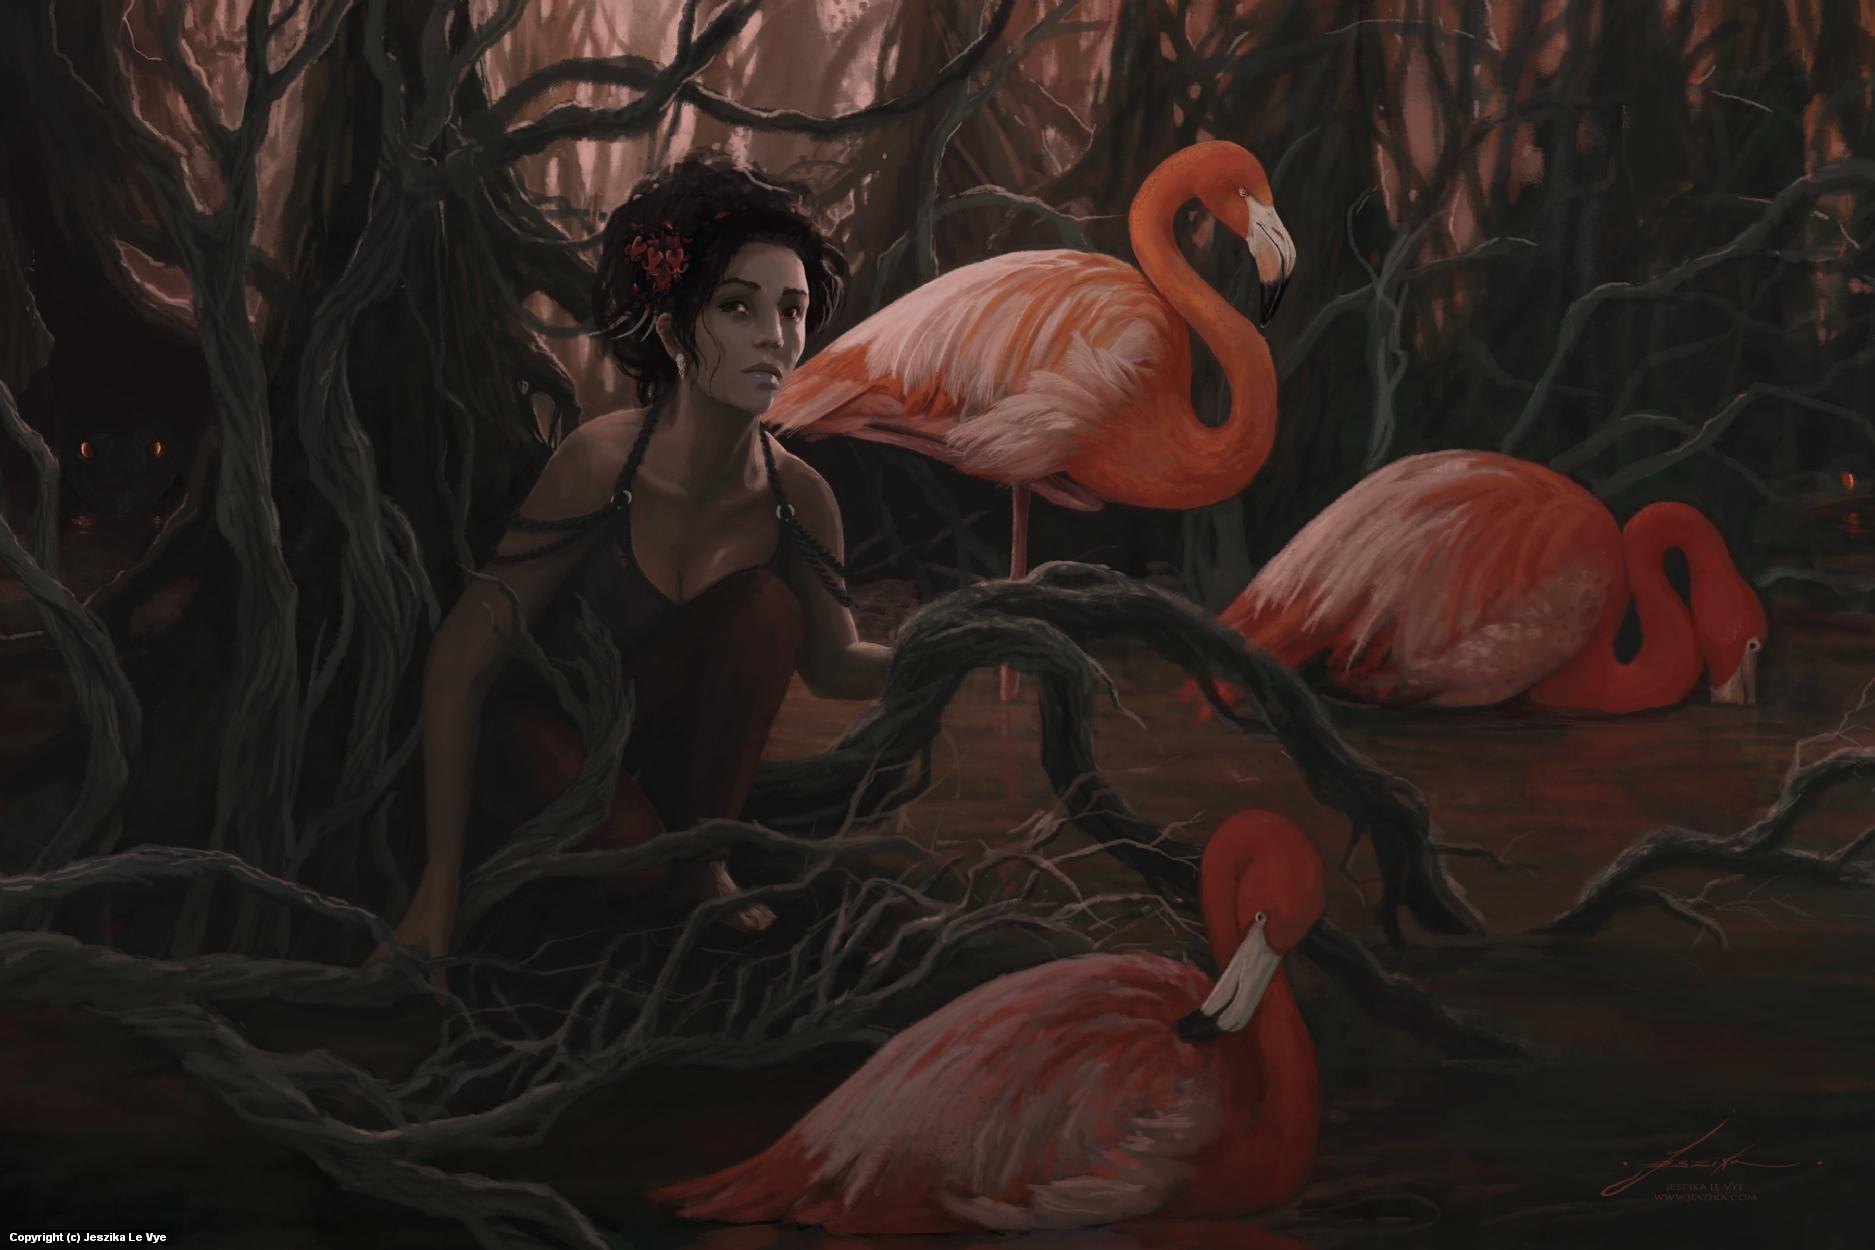 Crocodile Nest Artwork by Jeszika Le Vye